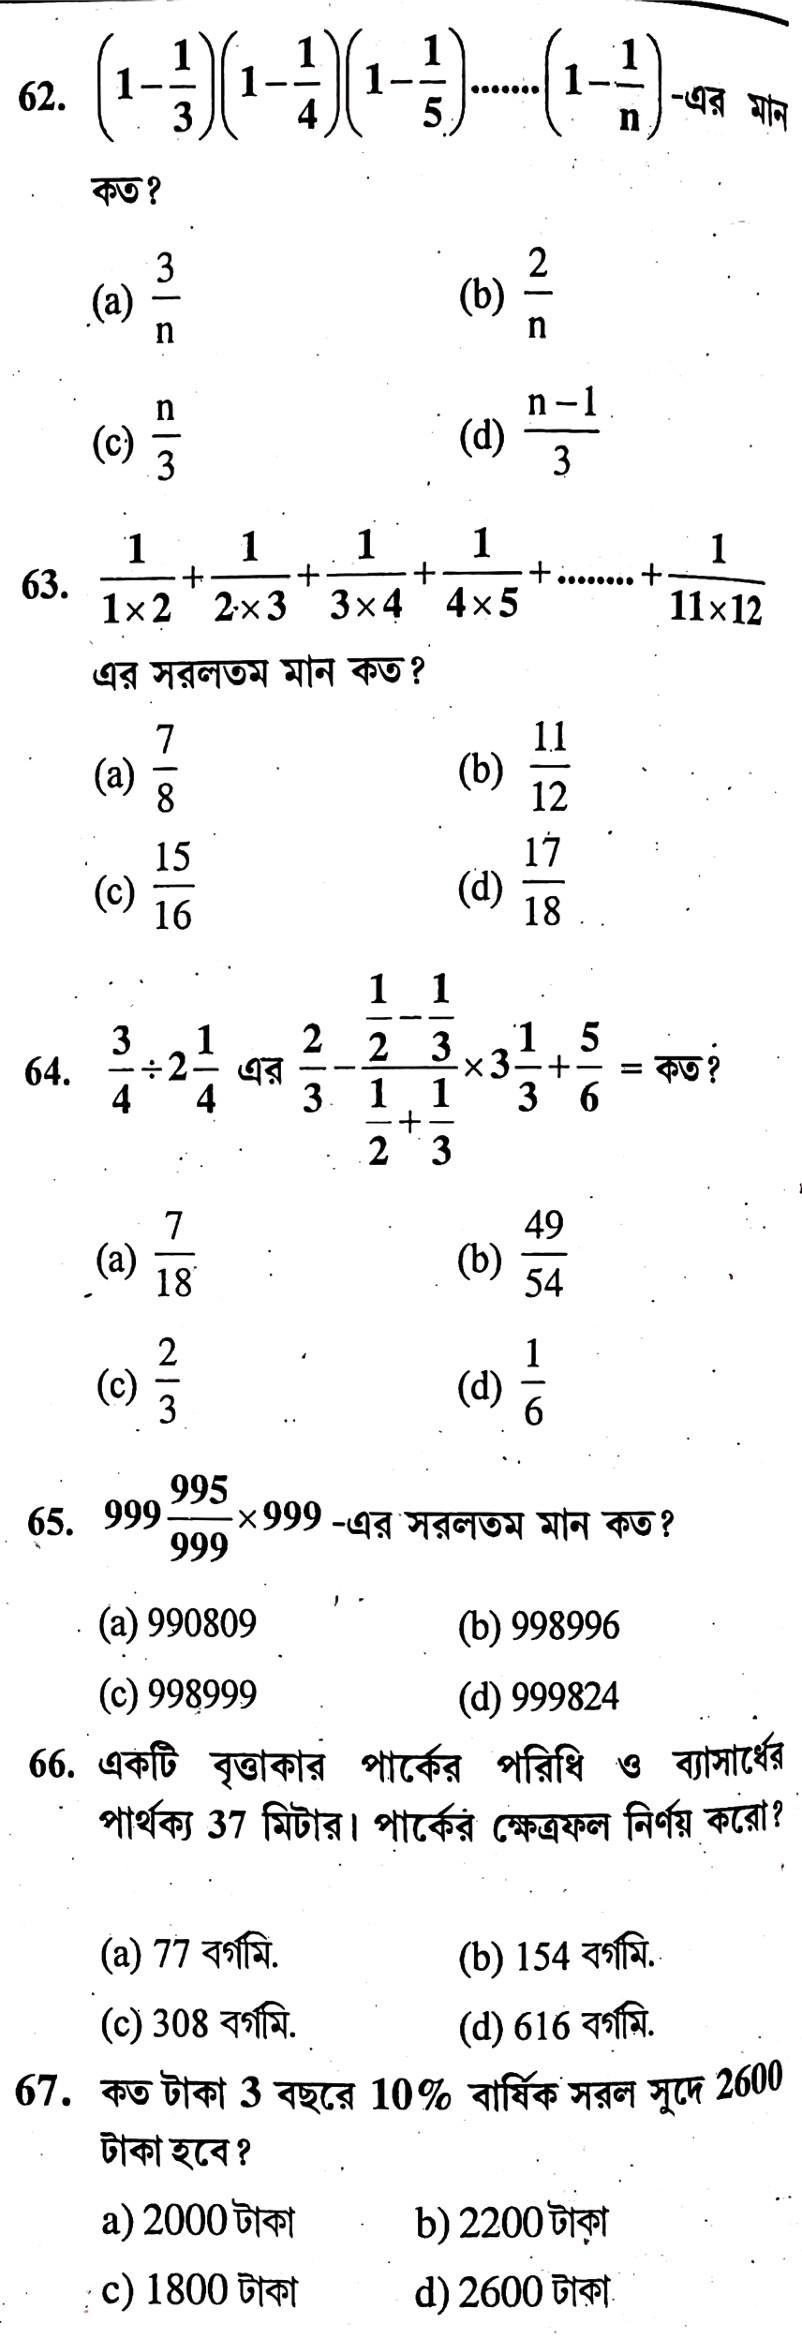 West Bengal Police Constable Preliminary Practice Set - 11 In Bengali    পশ্চিমবঙ্গ পুলিশ কনস্টেবল প্রিলিমিনারী প্র্যাকটিস সেট -১১